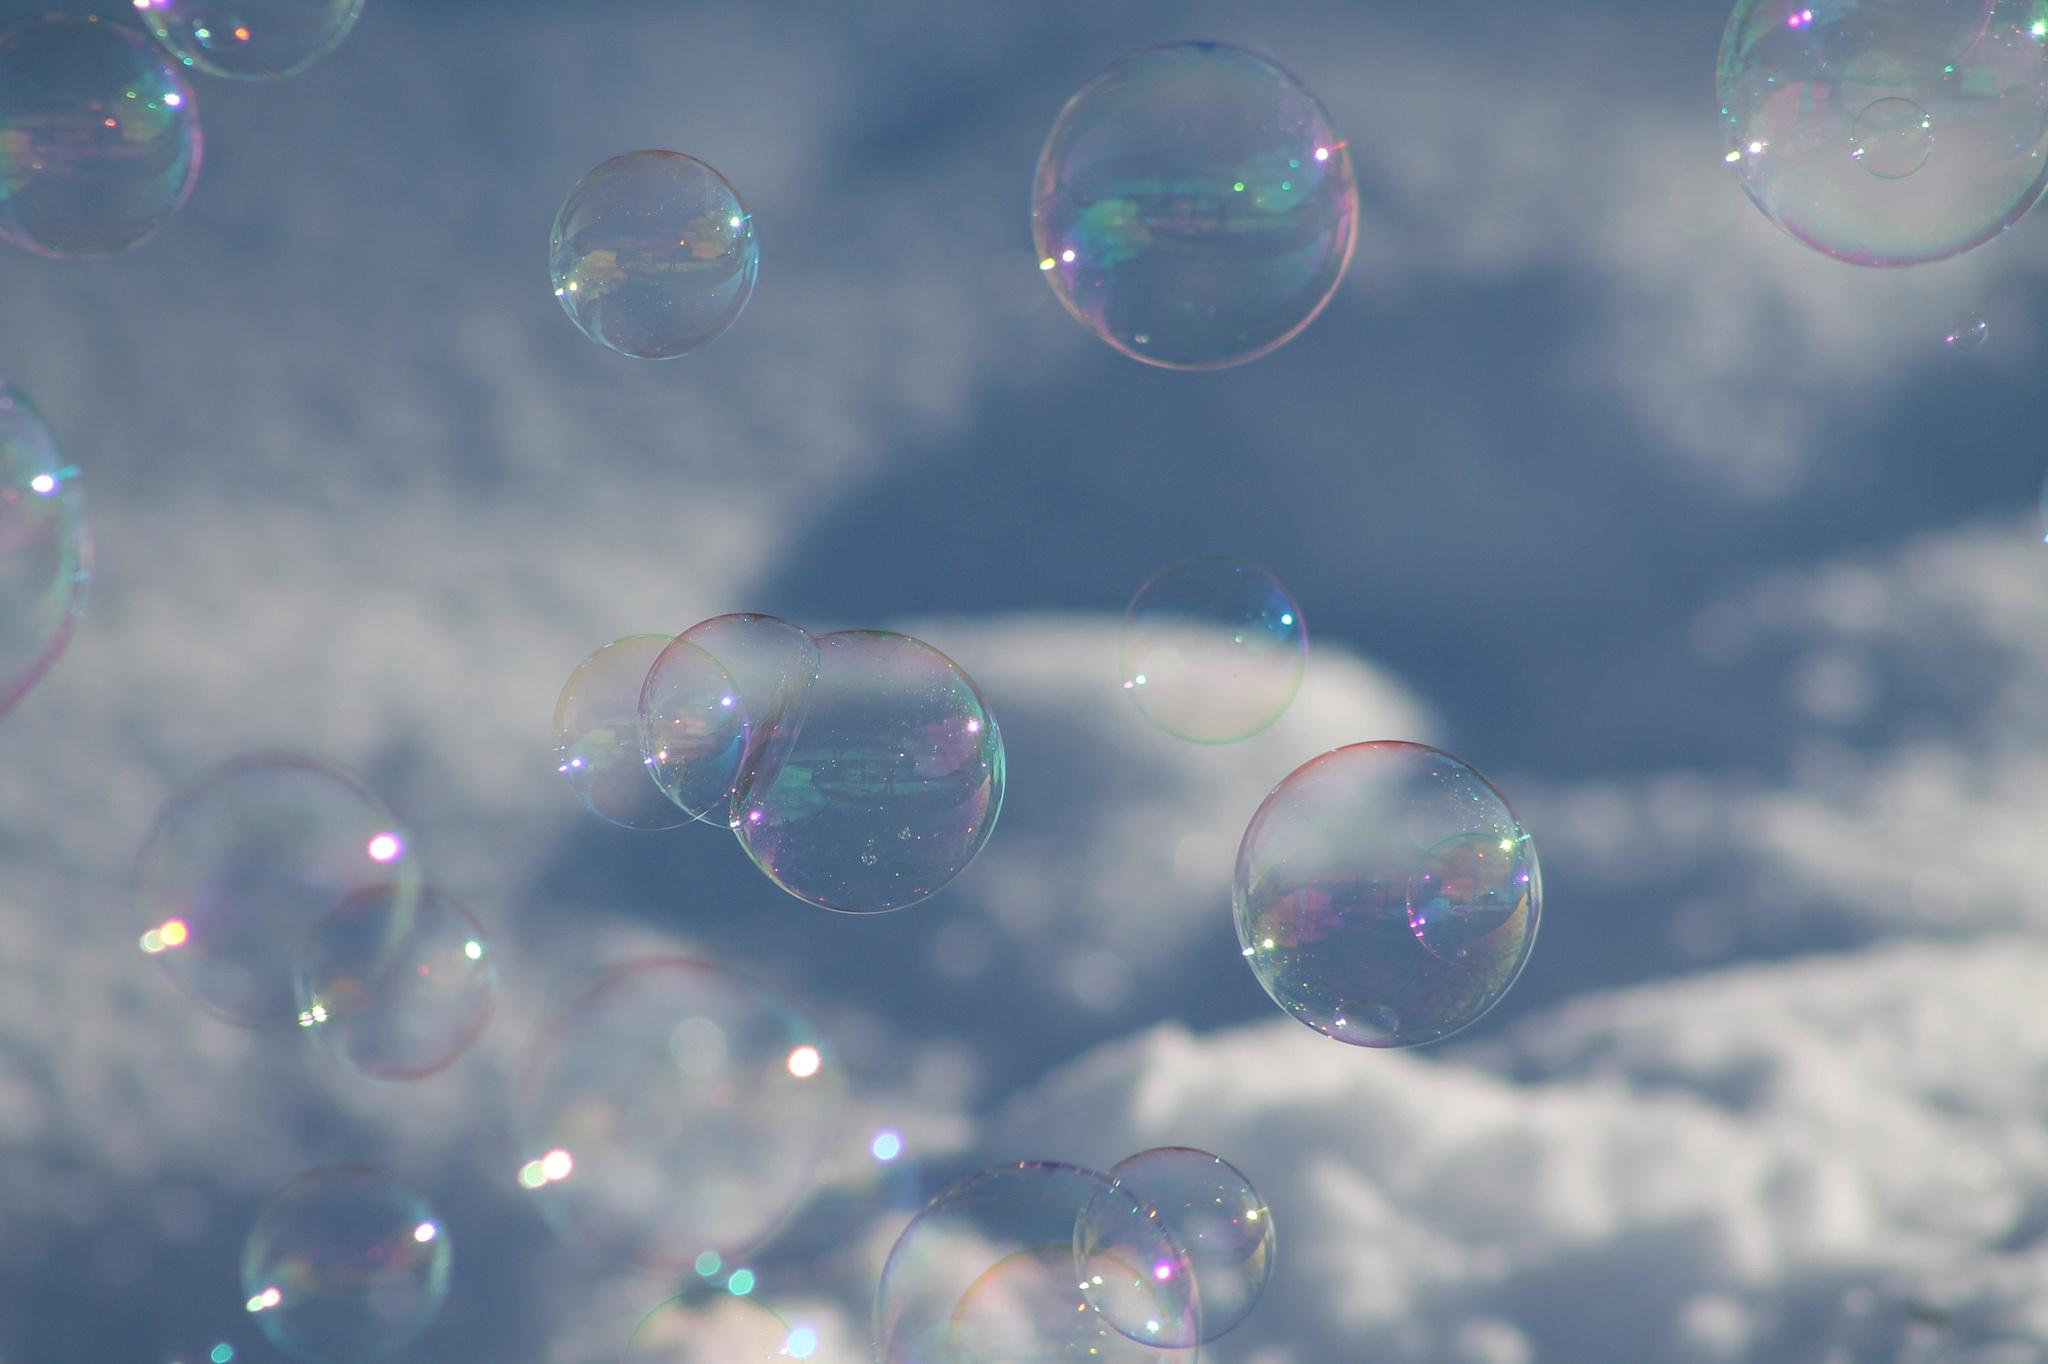 Winter Bubbles by Connie Kerik Holloway